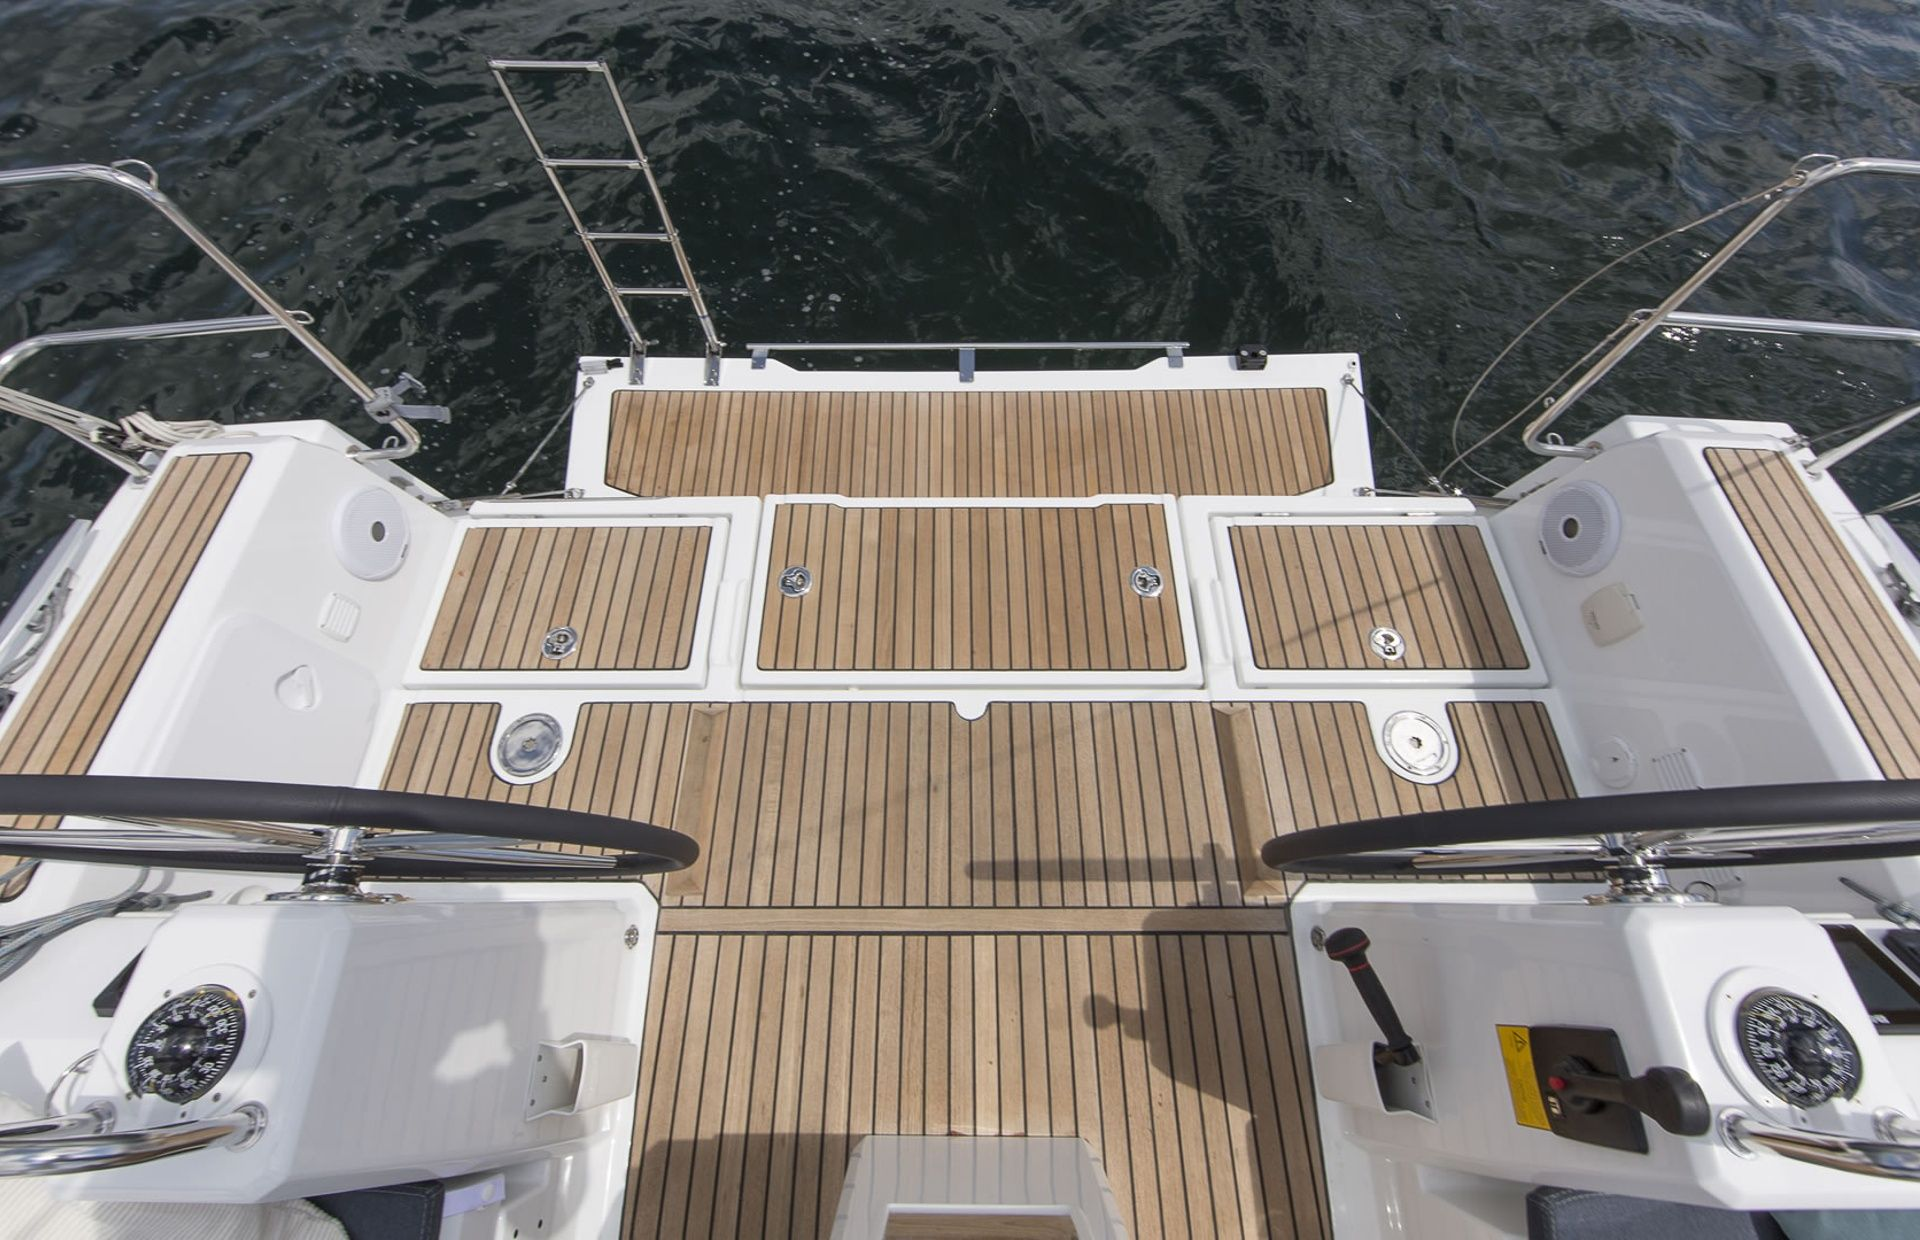 https://media.insailing.com/boat/benenteau-oceanis/image_1574089487570.jpg